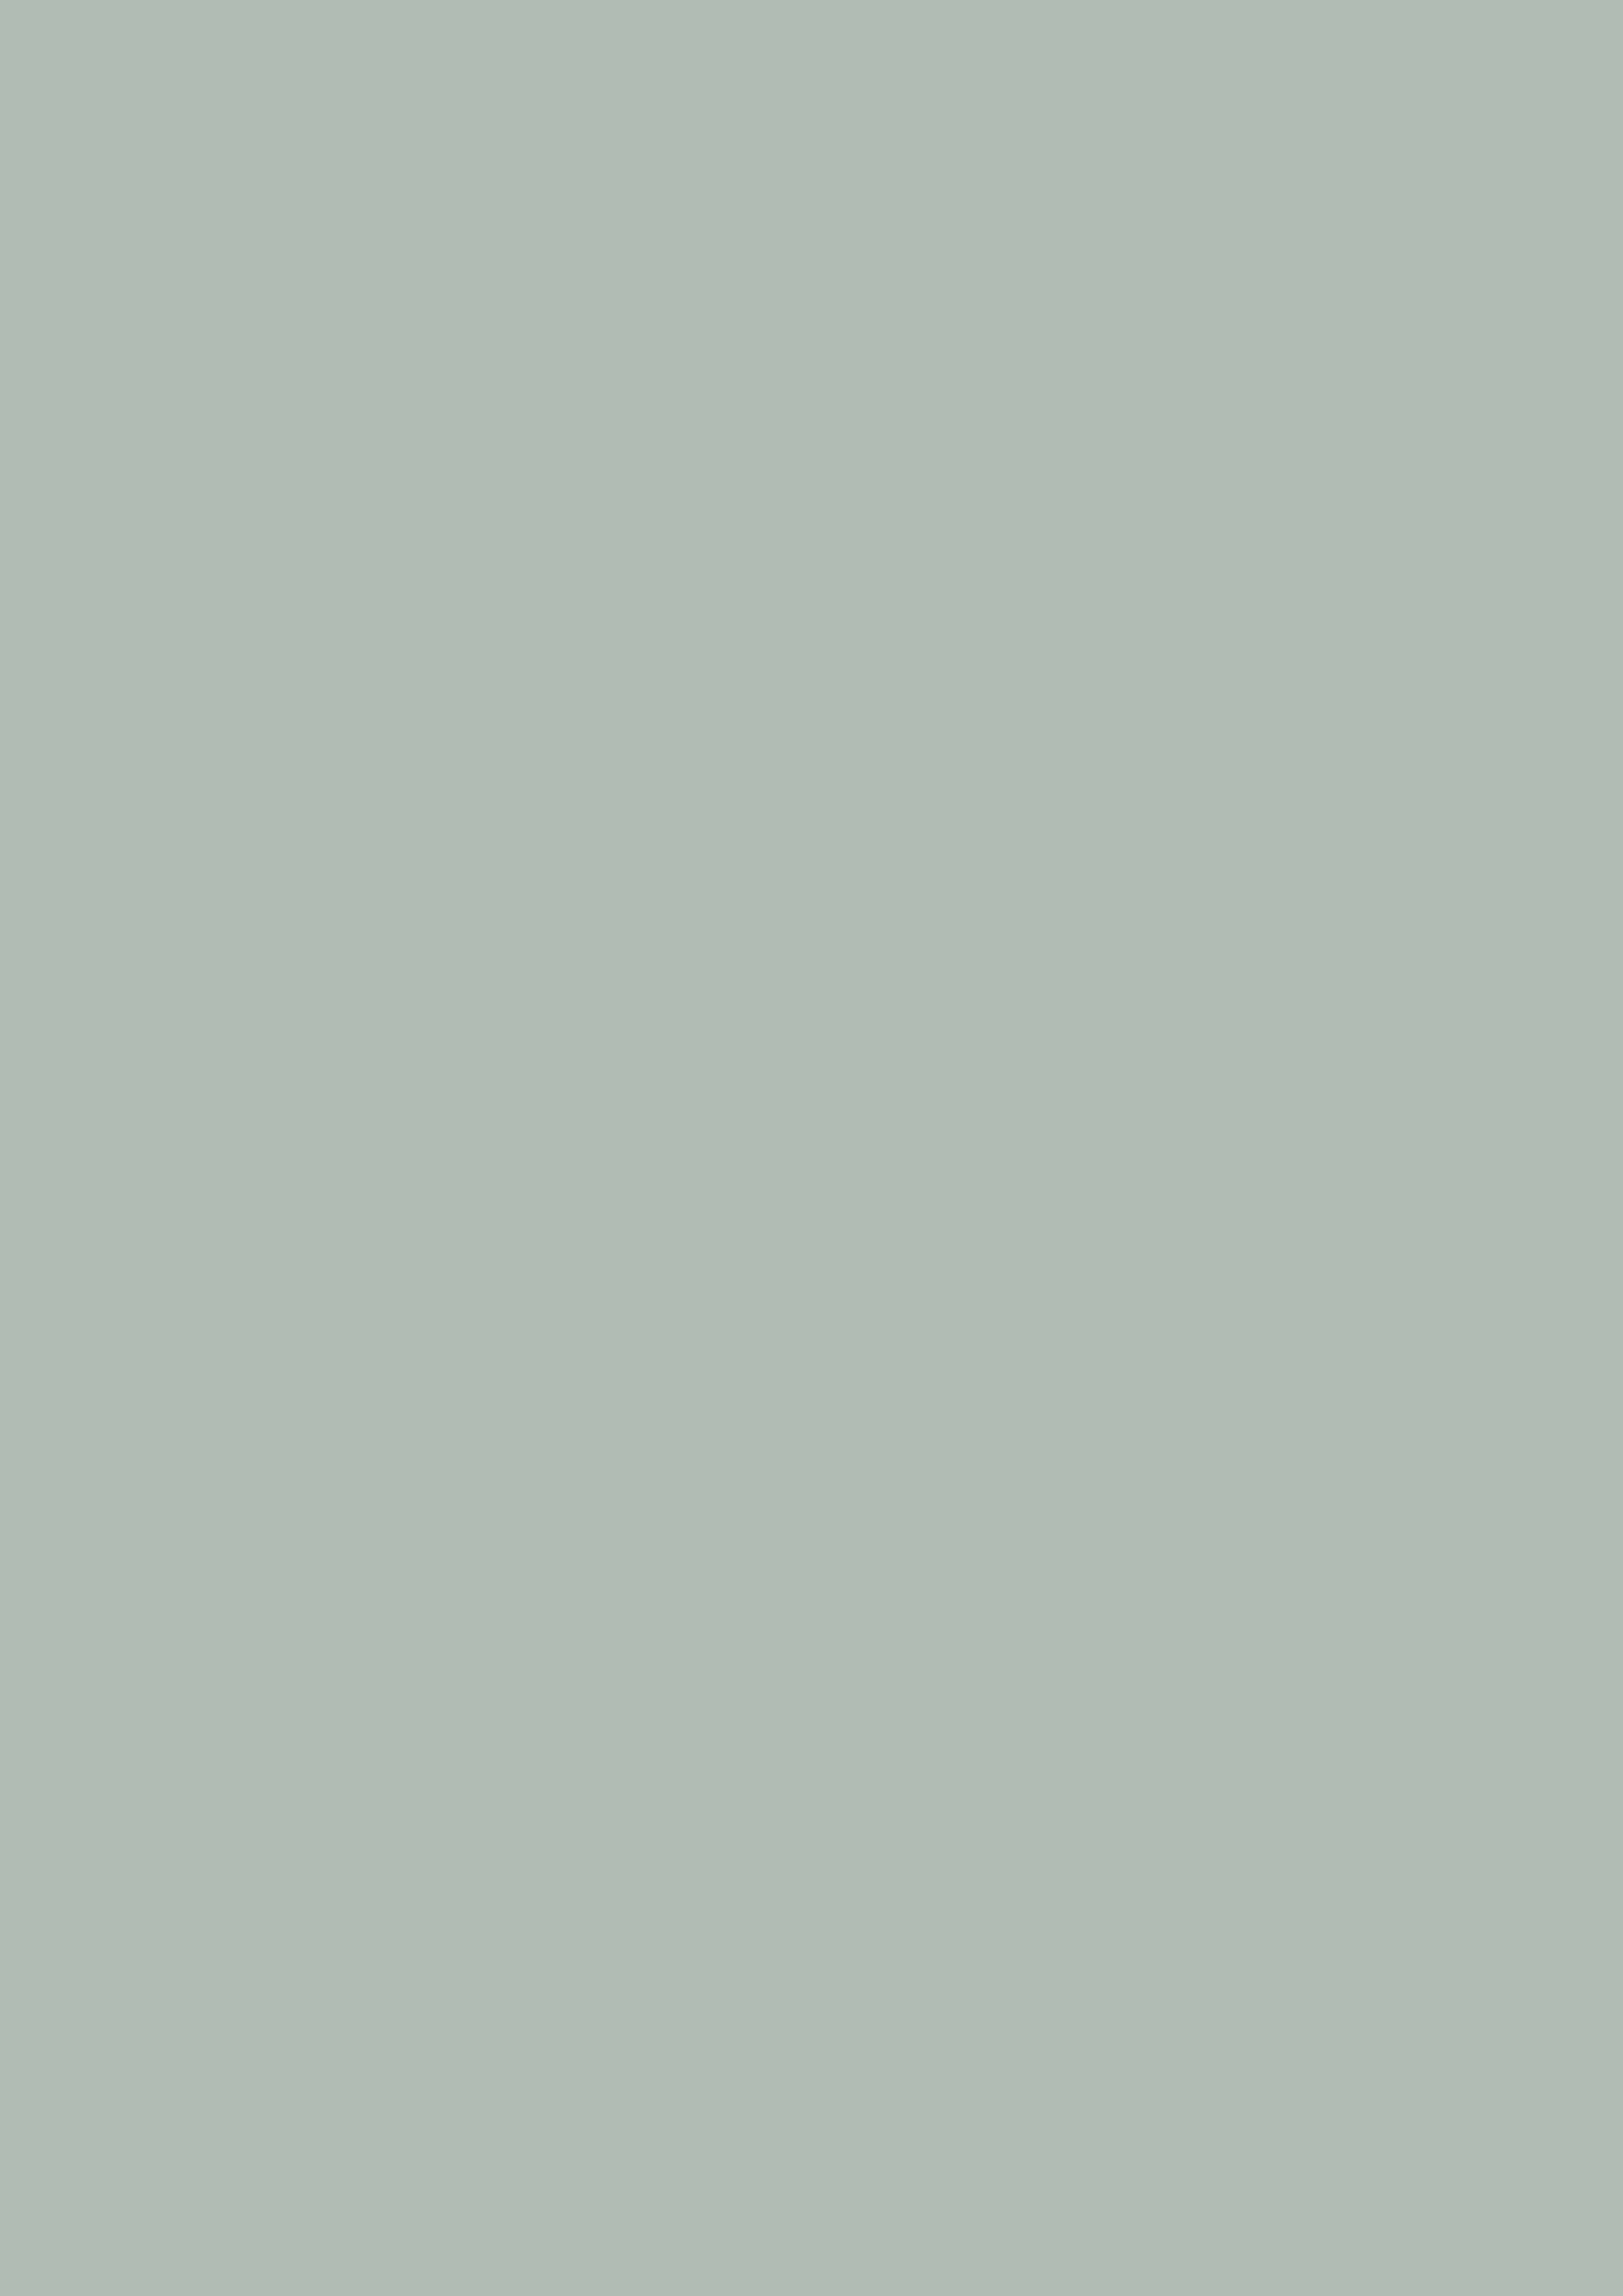 2480x3508 Ash Grey Solid Color Background